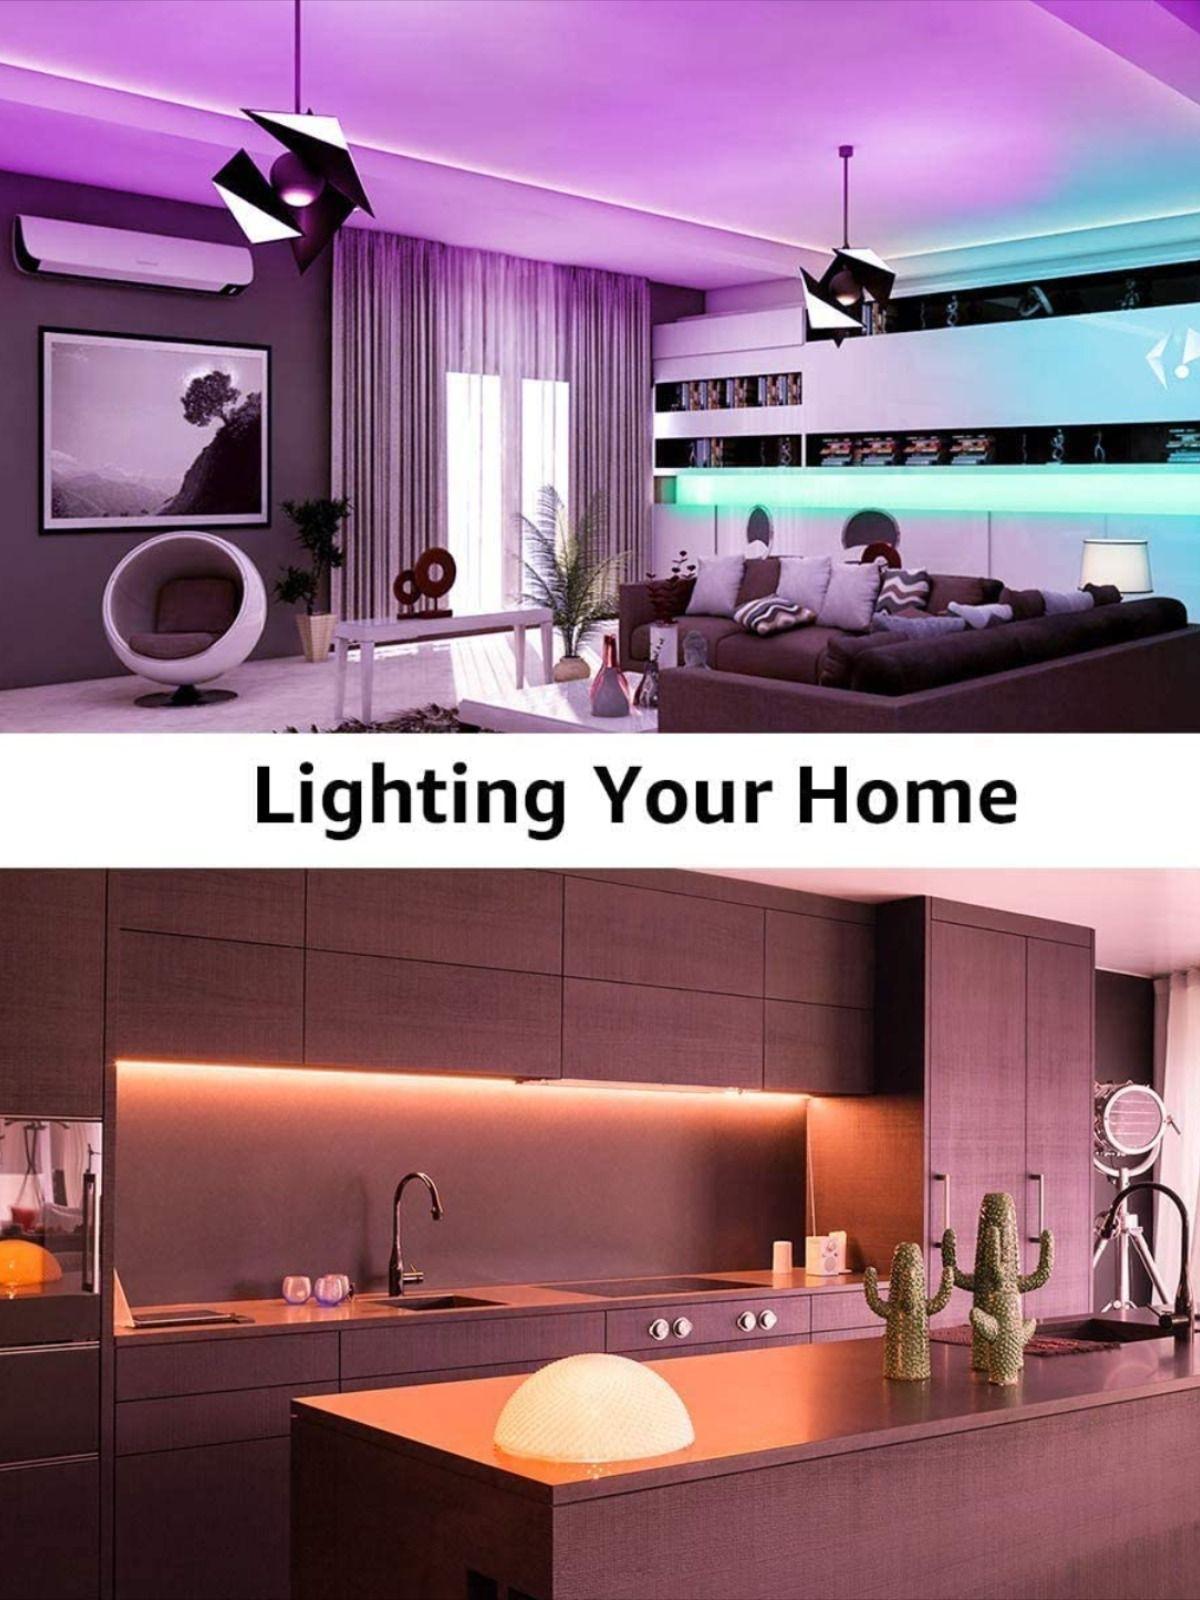 Changing Tape Light With 12v Power Supply For Room Bedroom Tv Kitchen Desk In 2021 Led Strip Lighting Strip Lighting Led Room Lighting